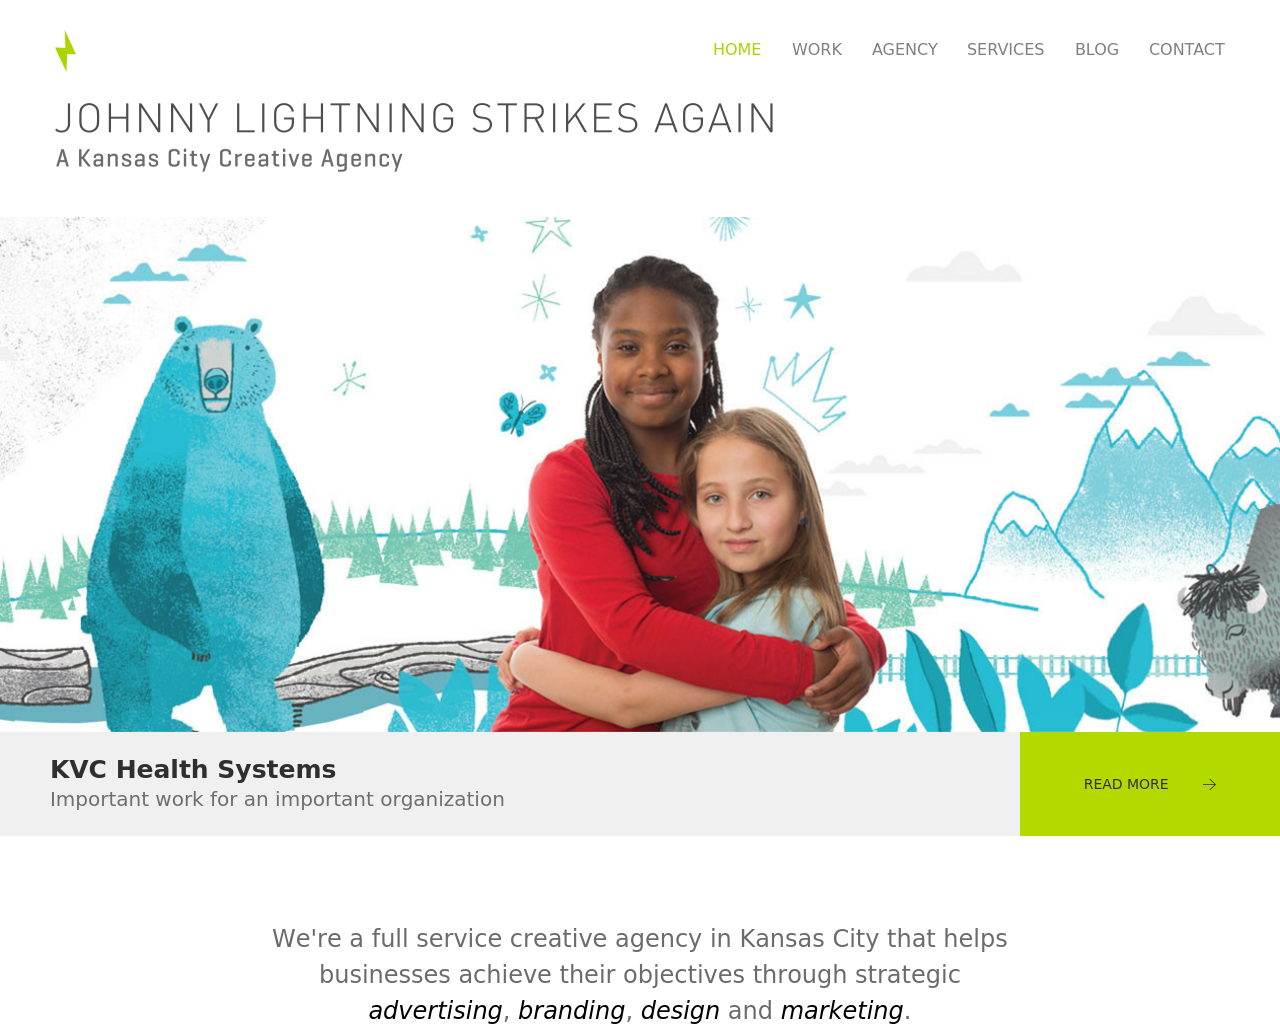 Johnny-Lightning-Strikes-Again-Advertising-Reviews-Pricing